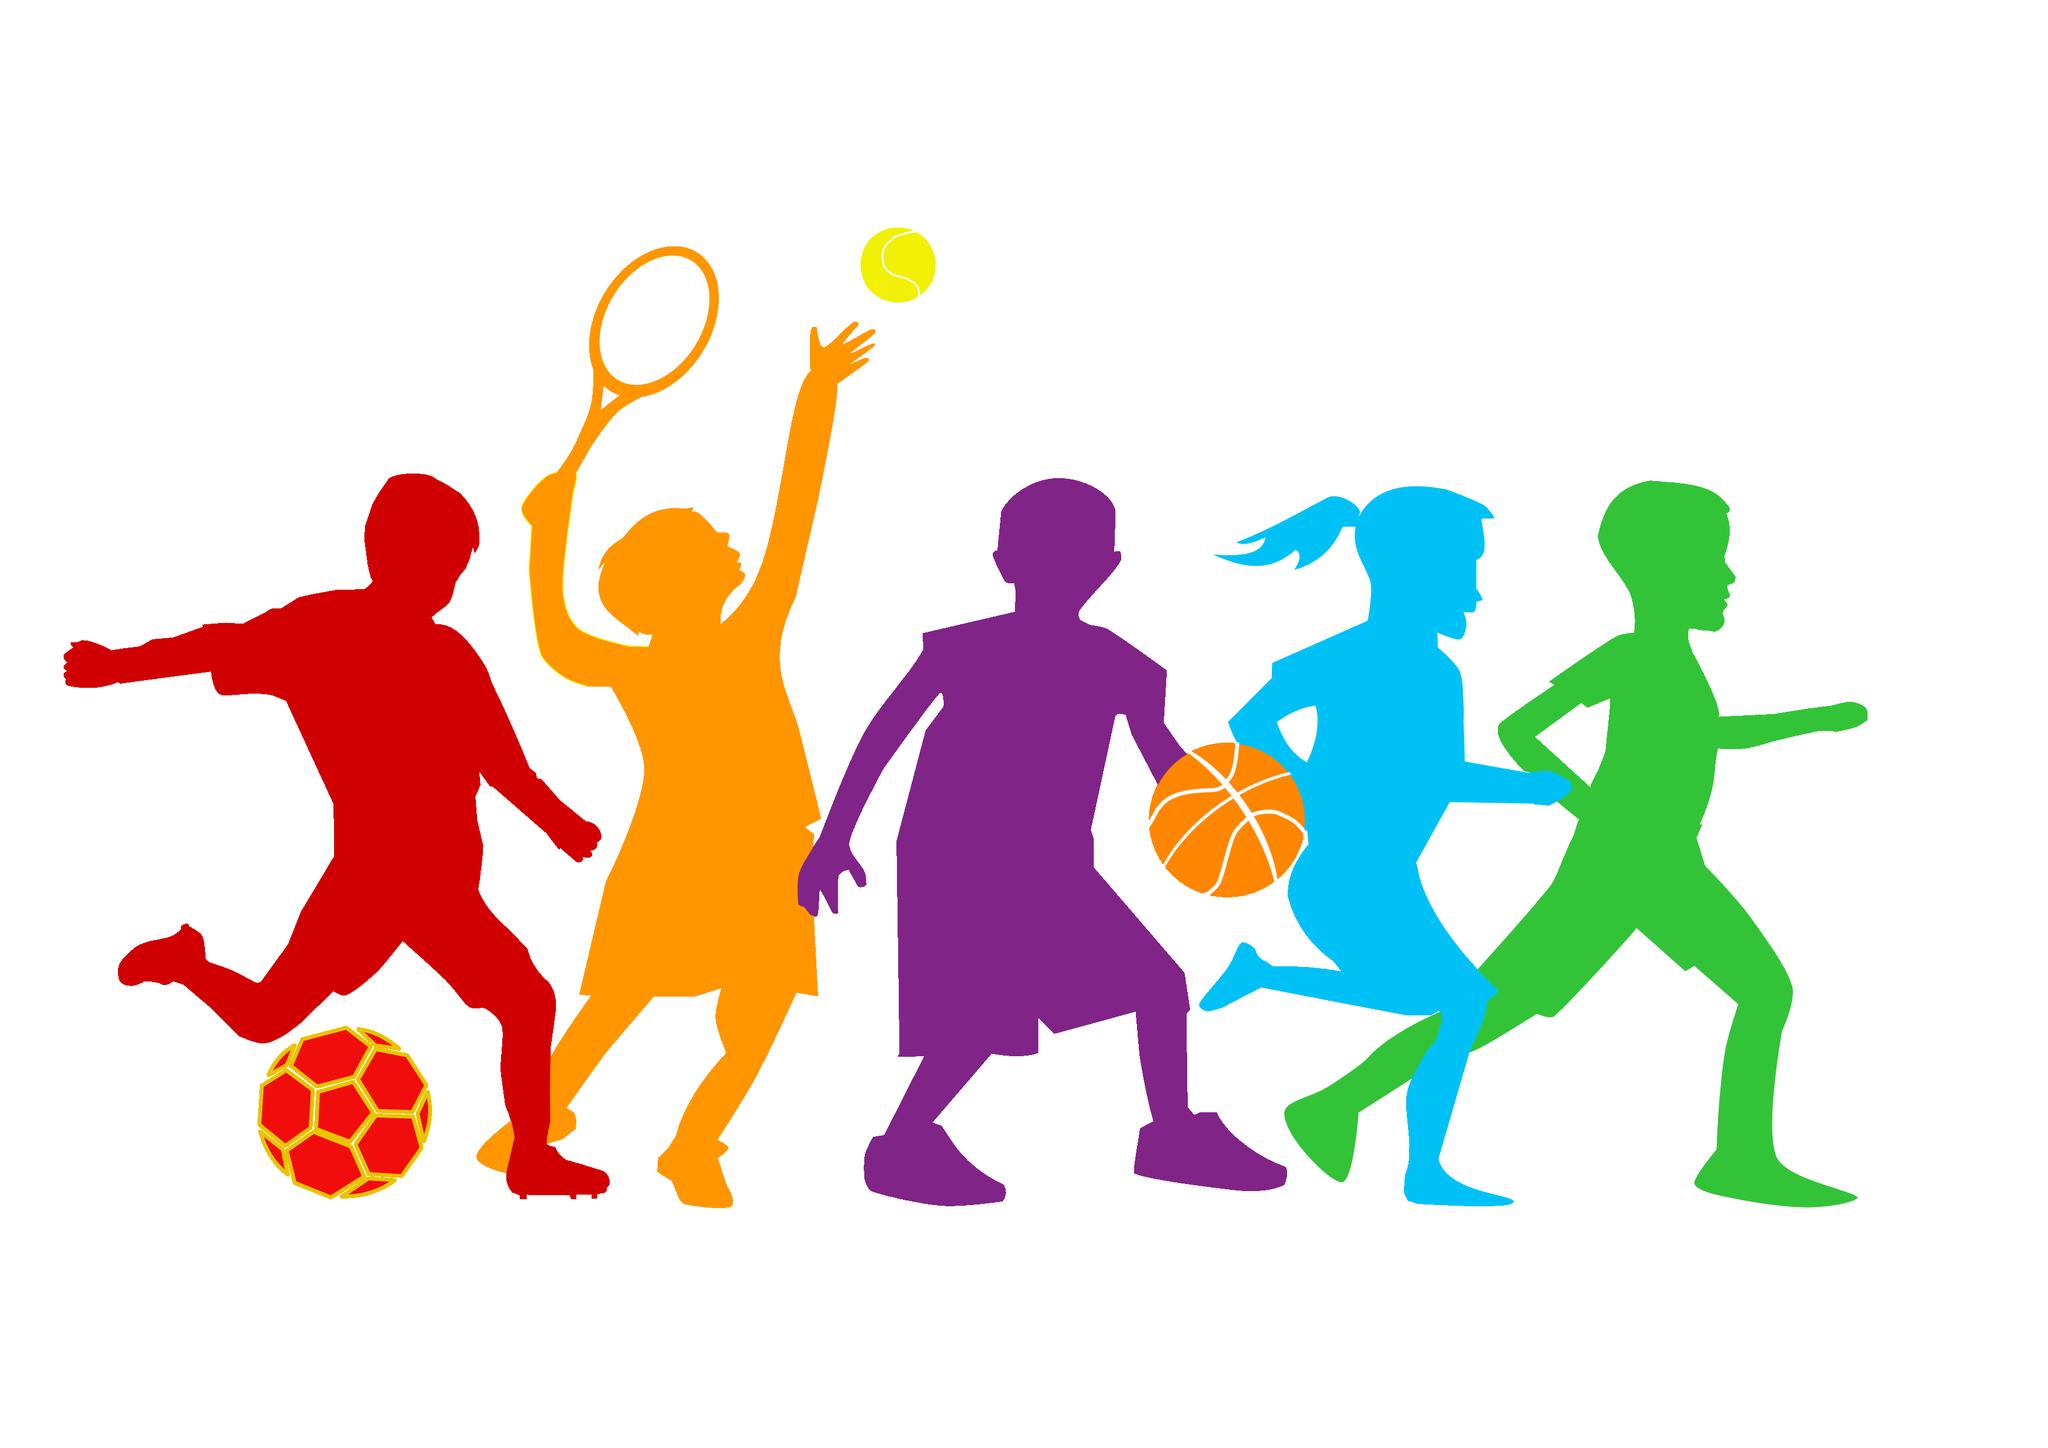 Спорт в школе картинки для презентации